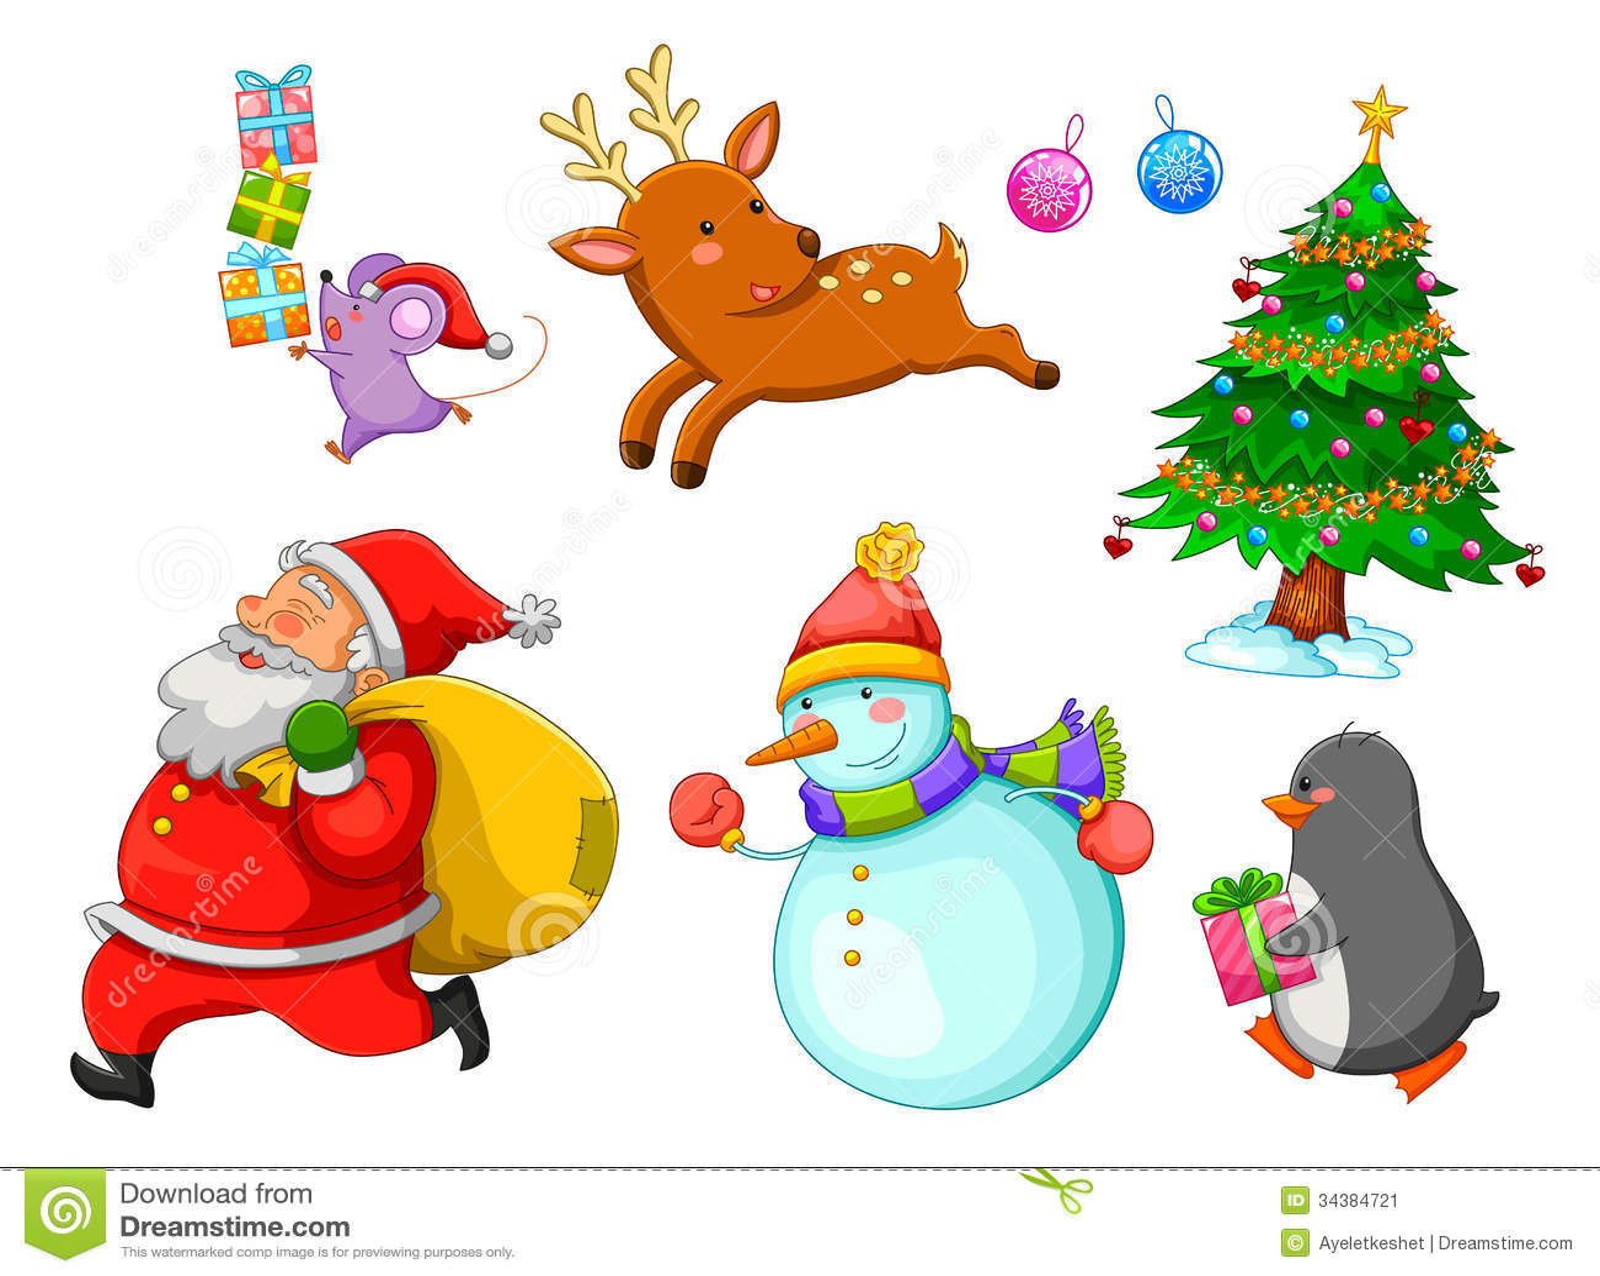 Christmas Cartoons Stock Image Image 34384721